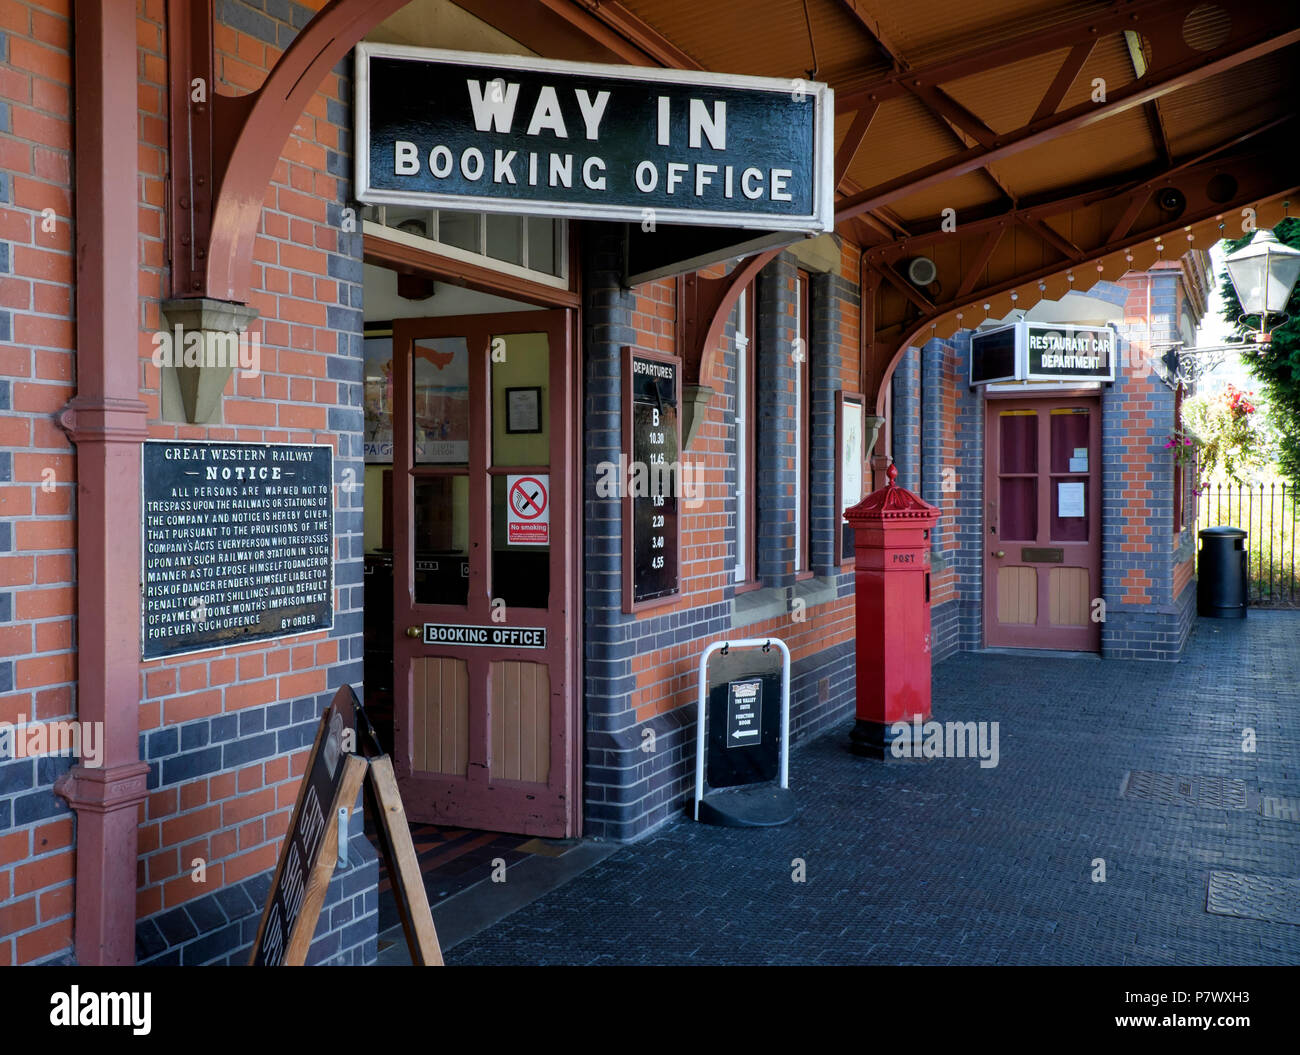 Kidderminster Severn Valley Railway Station, Kidderminster, Worcestershire, England, Europe - Stock Image